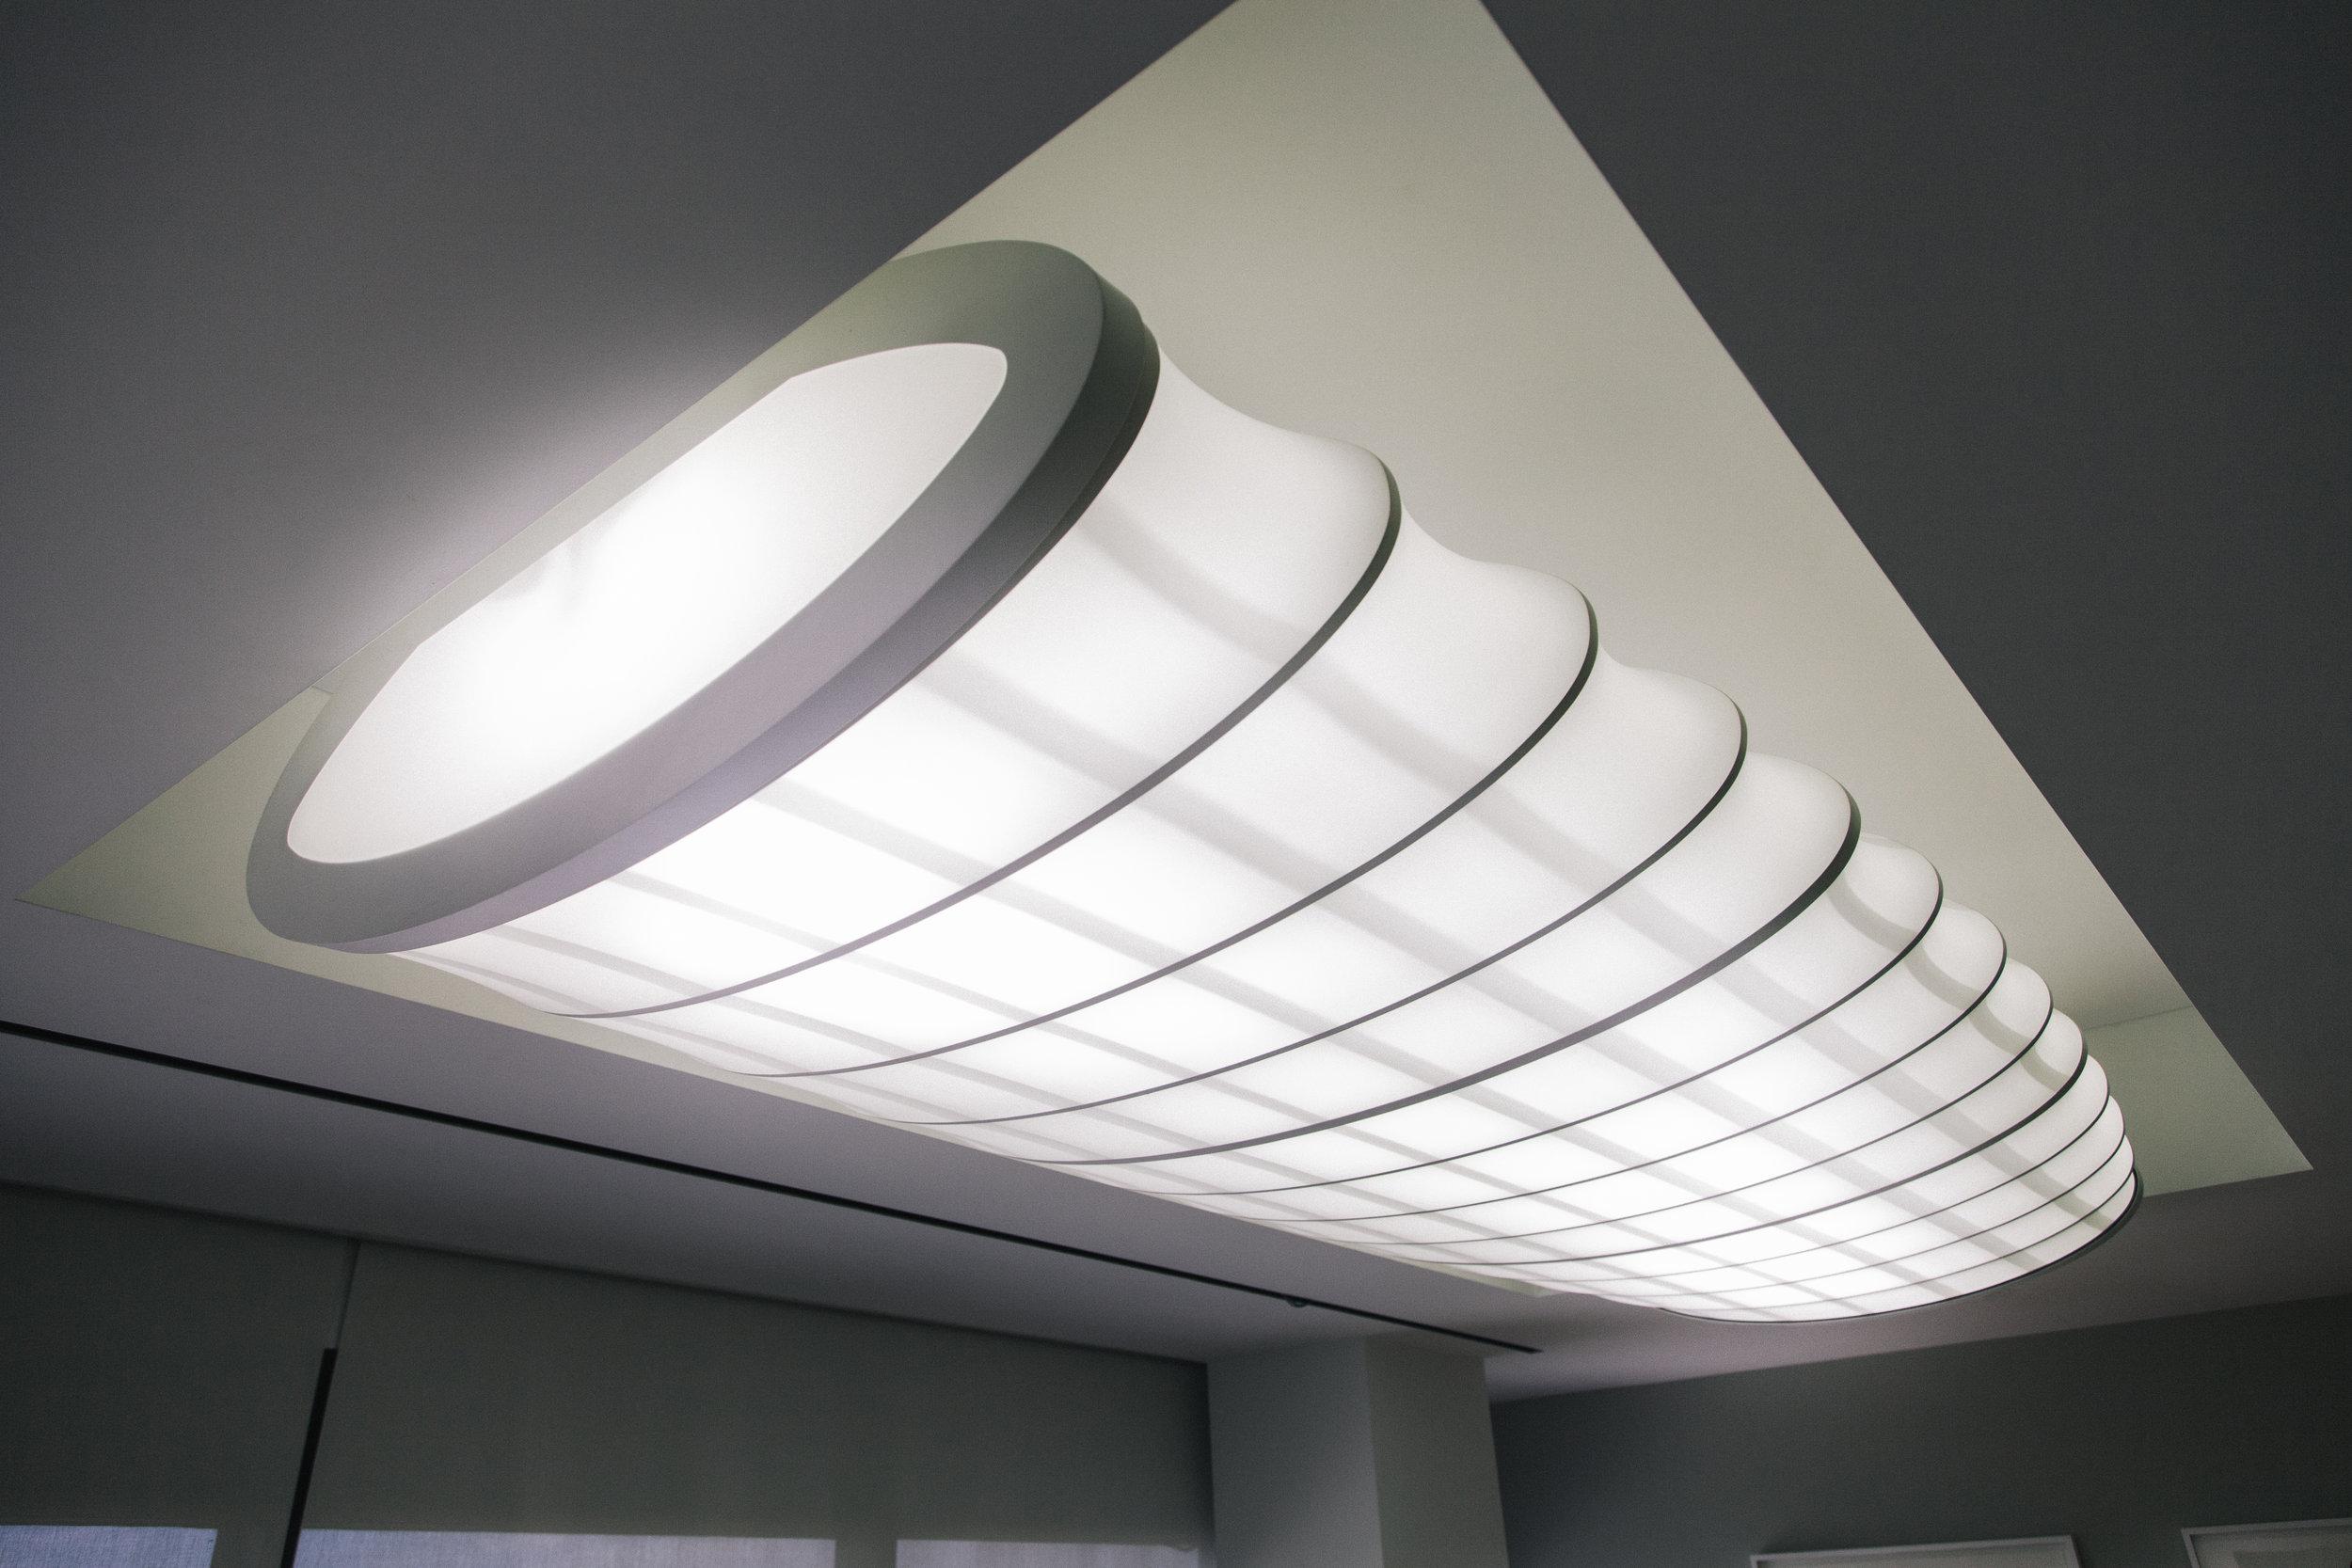 S.E.A.-Studio-Environmental-Architecture-David-Hertz-FAIA-First-Pacific-Advisors-Los-Angeles-tenant-improvement-sustainable-regenerative-restorative-green-design-office-sleek-modern-interior-Westside-commercial-building-professional-workplace-13.jpg